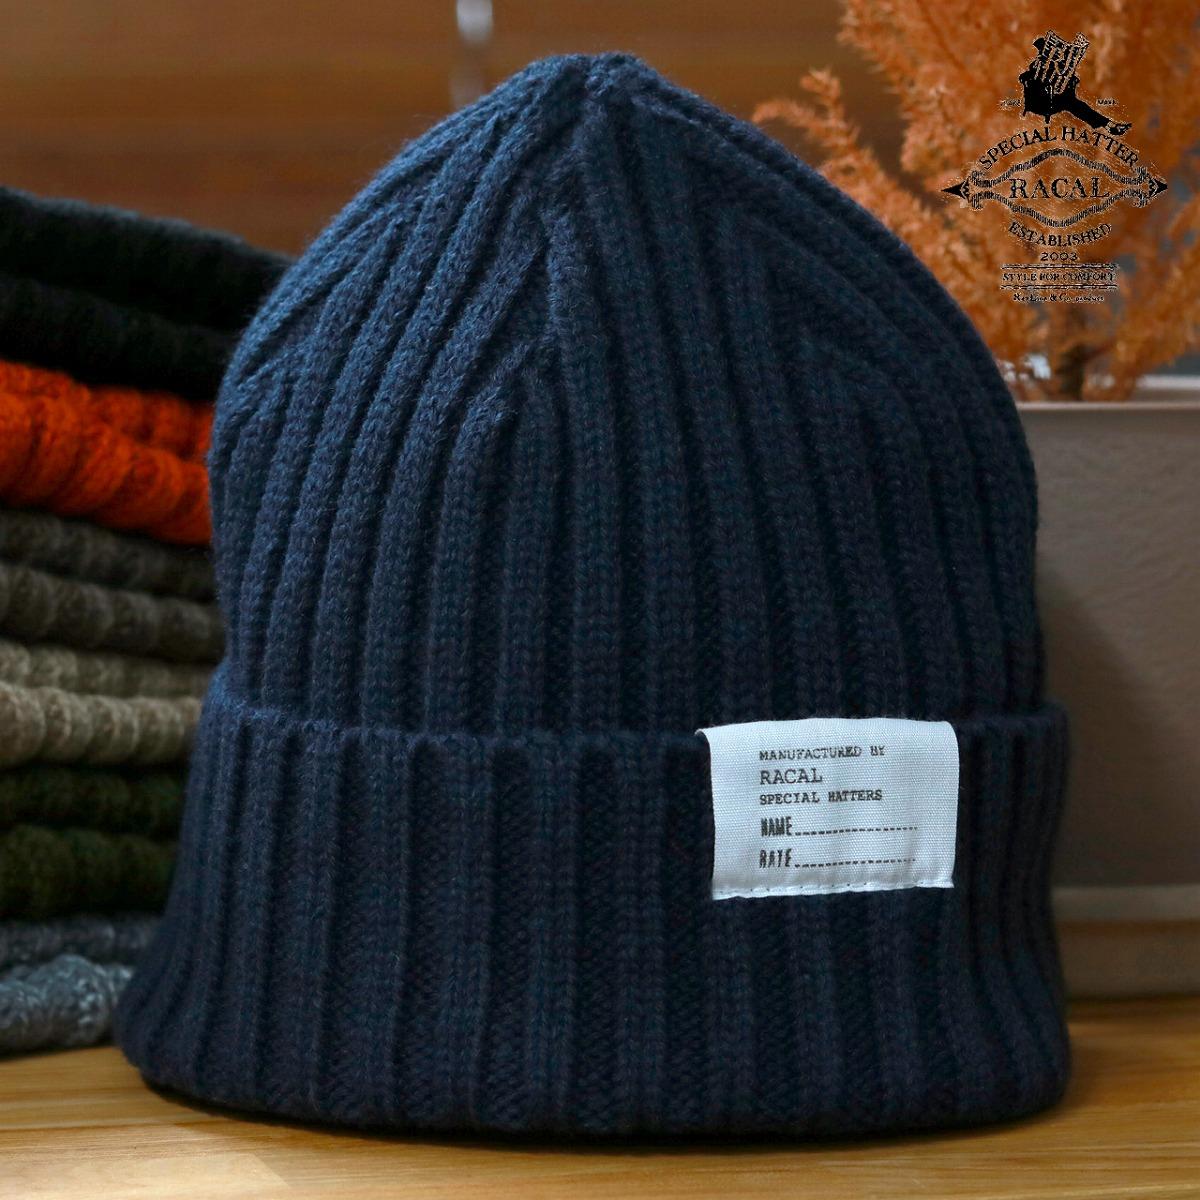 ab472705827c0 ... レディースフリーサイズニットワッチシンプル plain fabric racal beanie tag made in ラカルニット hat  men rib knit constant seller wool watch cap knit hat ...